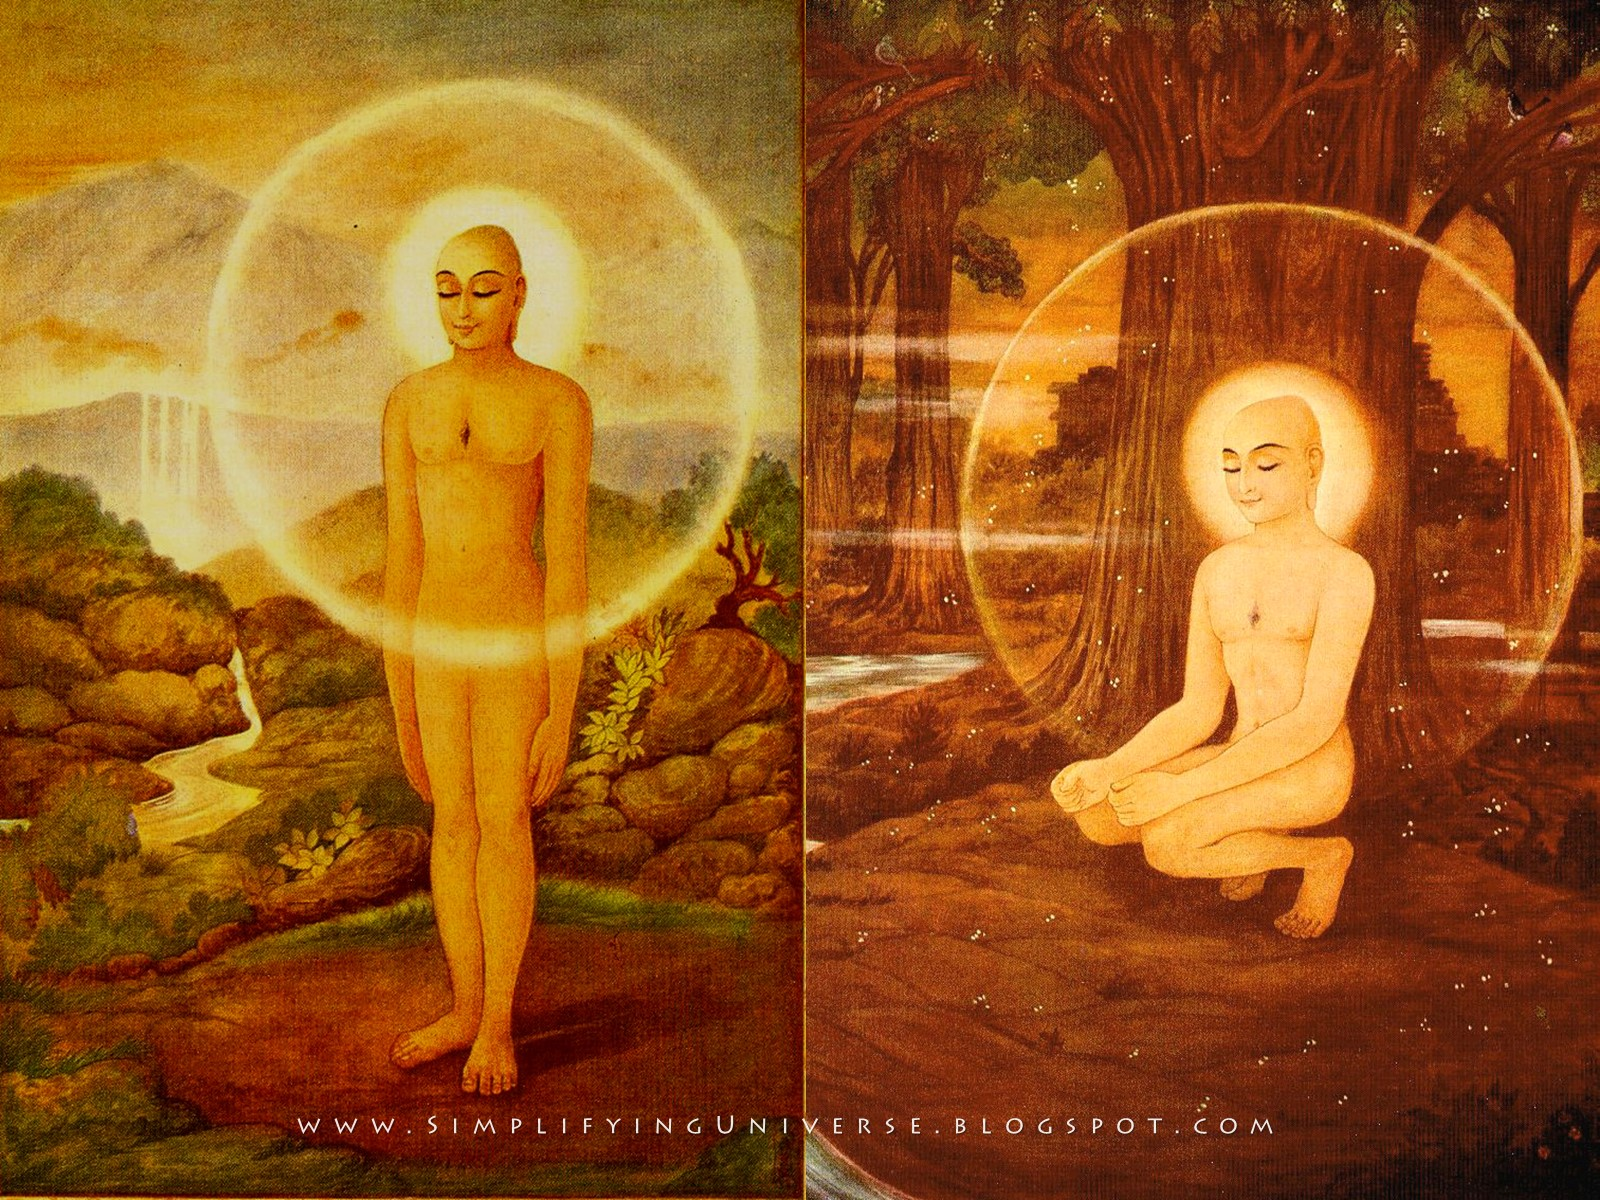 Mahavira Jayanti, Bhagwan Mahavir Vani, jain aagam, lord mahavir quotes, manas madrecha, jainism, jain religion, jainism quotes, tirthankar, arihant